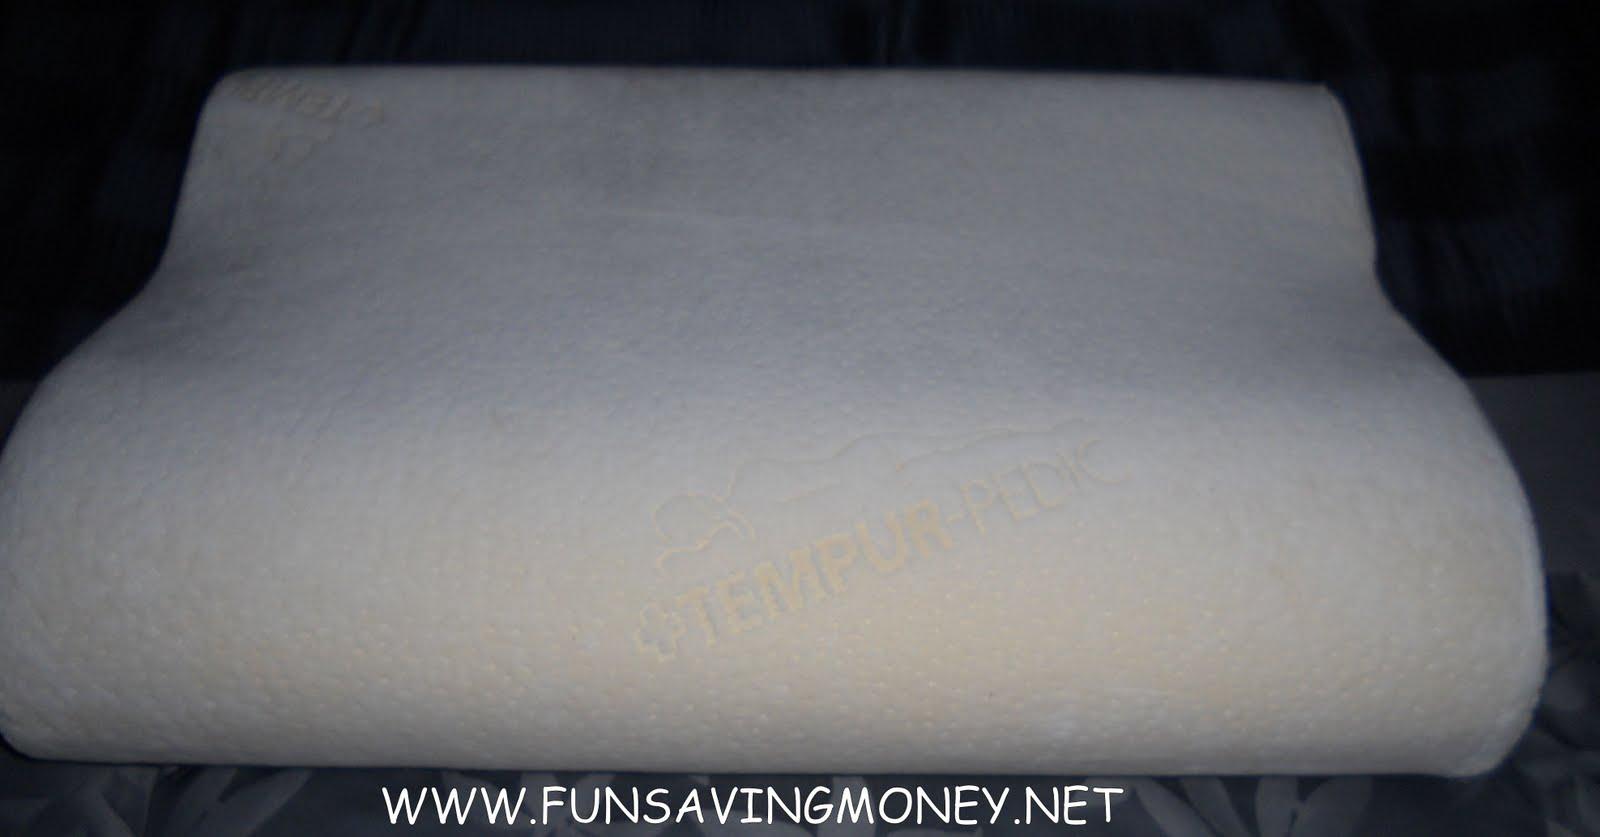 Tempur Traditional Pillow Medium Review : Sleepy s Tempur-Pedic Medium Neck Pillow Review and Giveaway! - Fun Saving Money